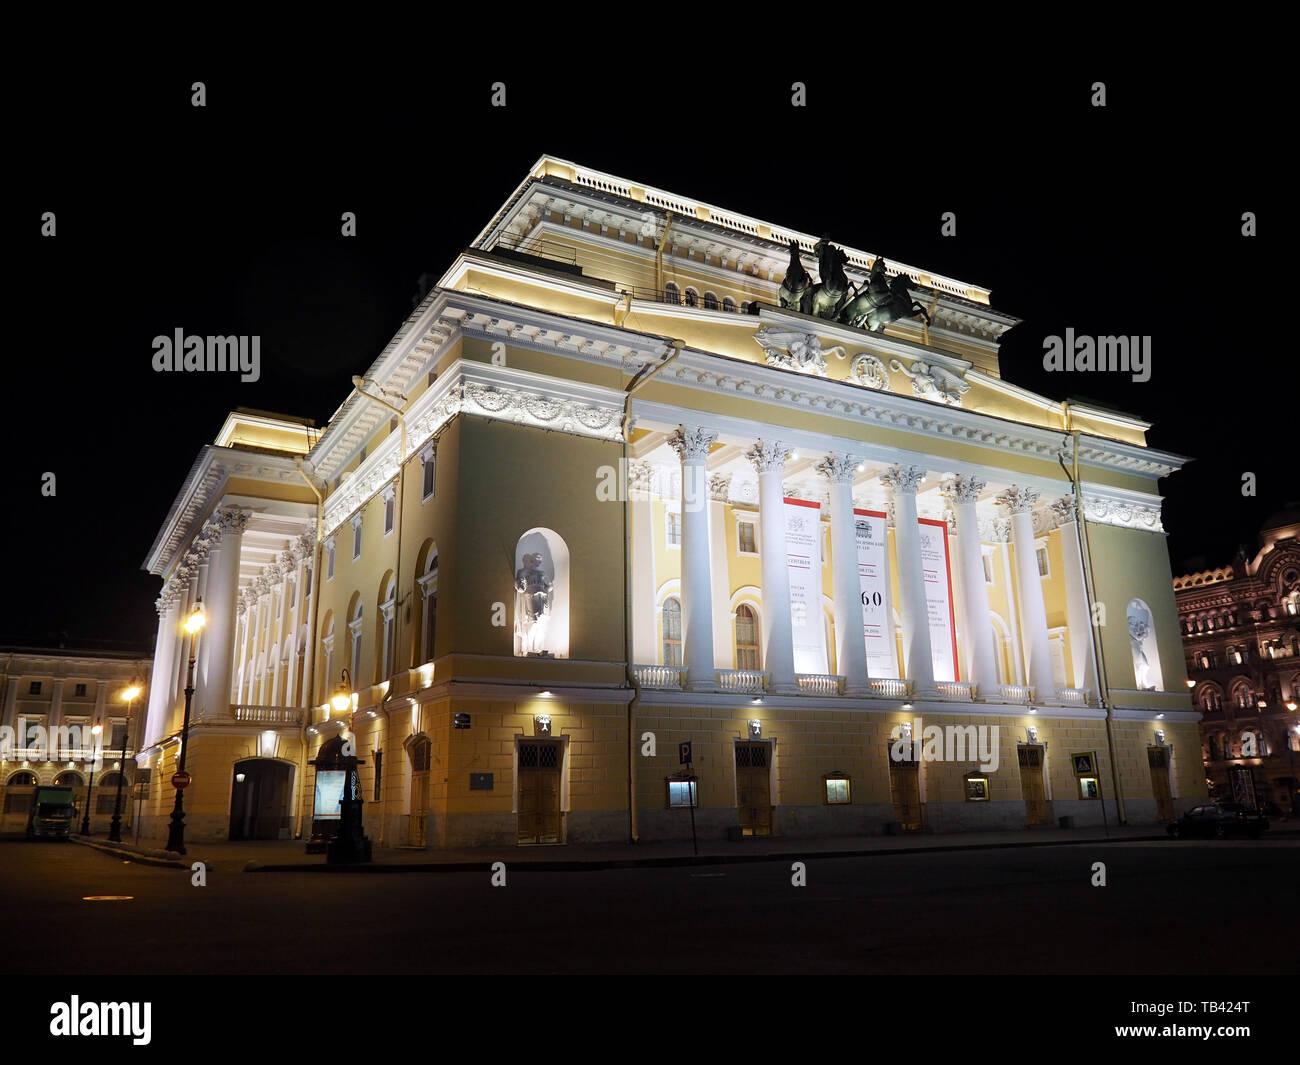 Alexandrinsky Theatre, Russian State Pushkin Academy Drama Theater, Saint Petersburg, Russia - Stock Image